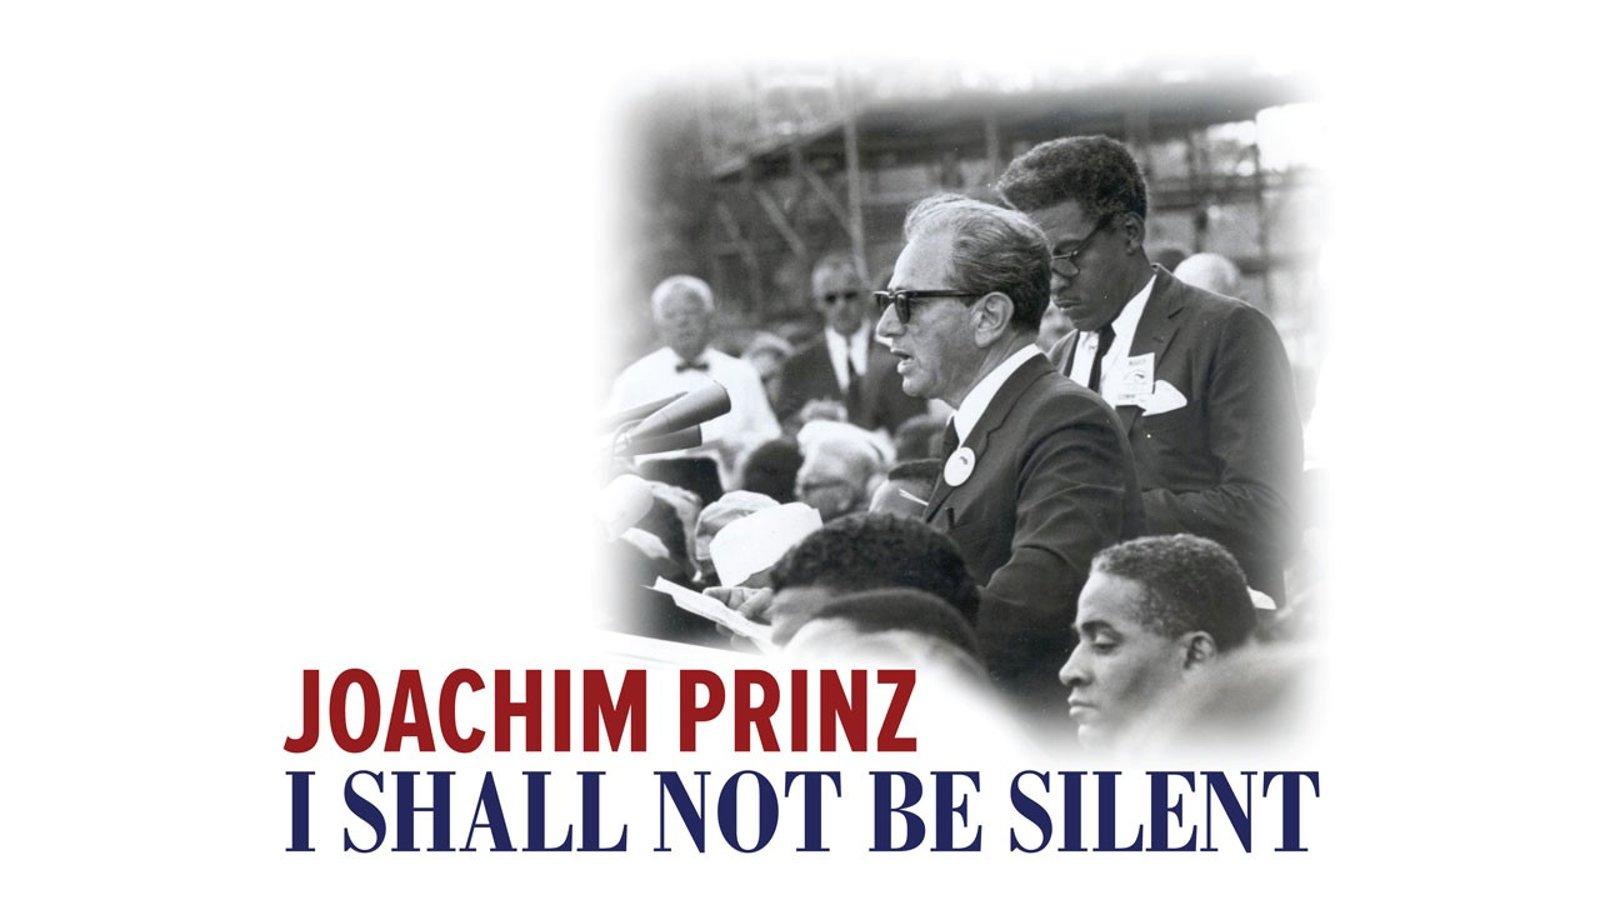 Joachim Prinz: I Shall Not Be Silent